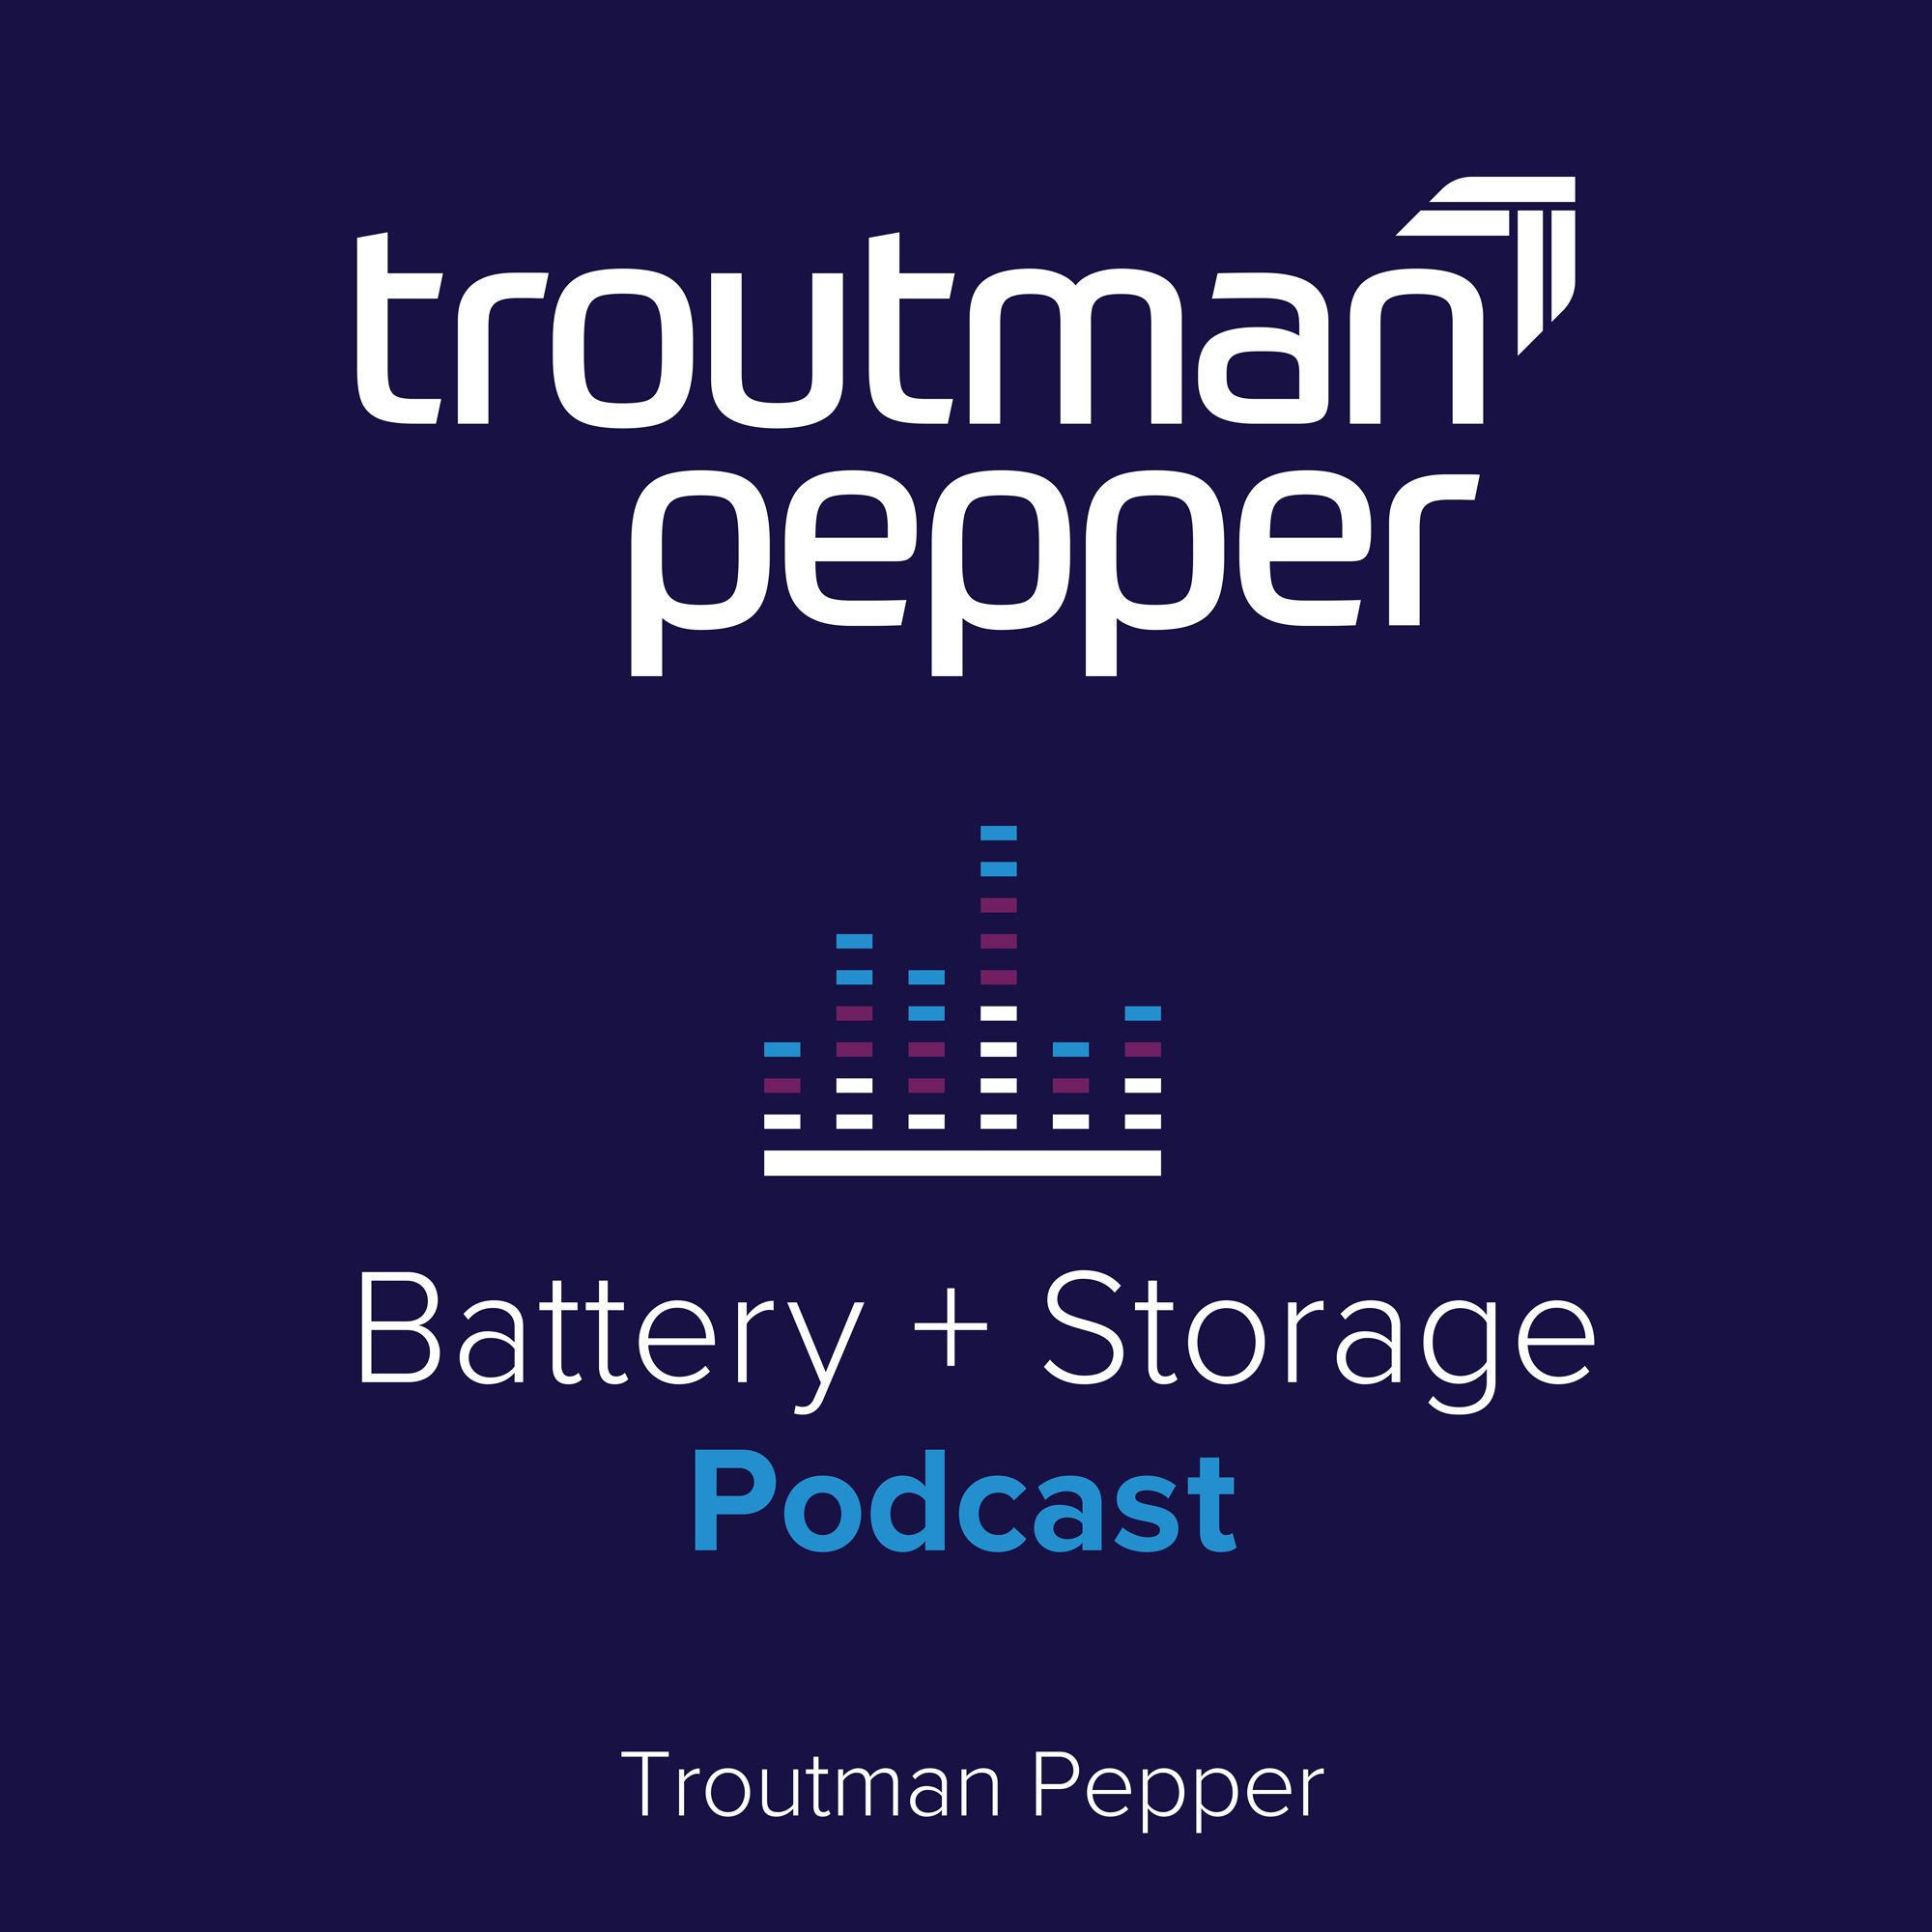 Battery + Storage Podcast